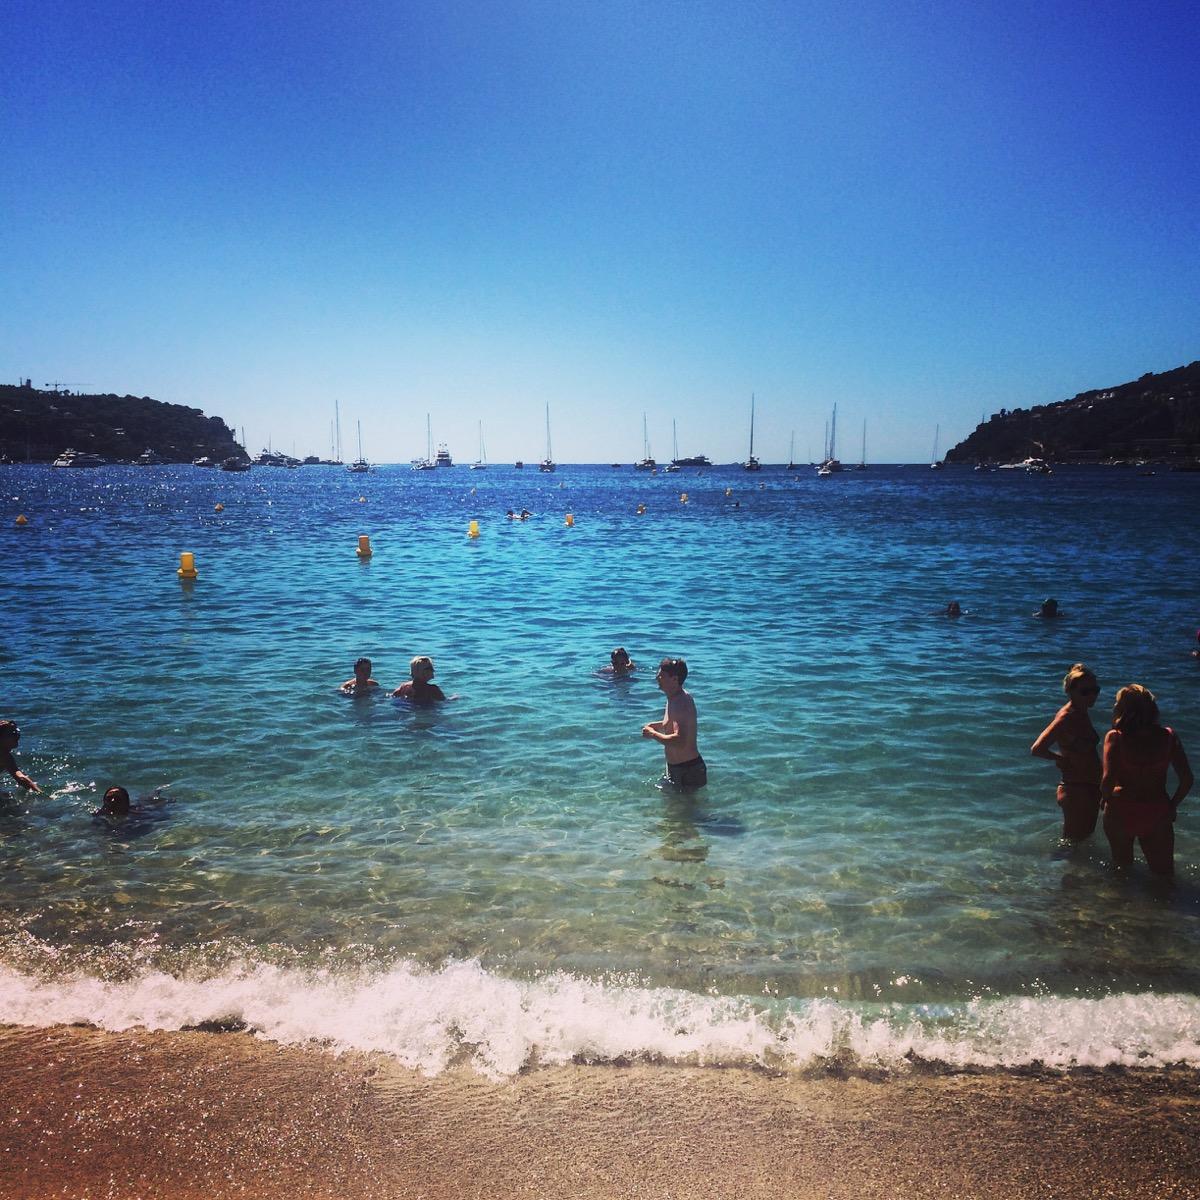 Deli Bo, Côte d'Azur, France.